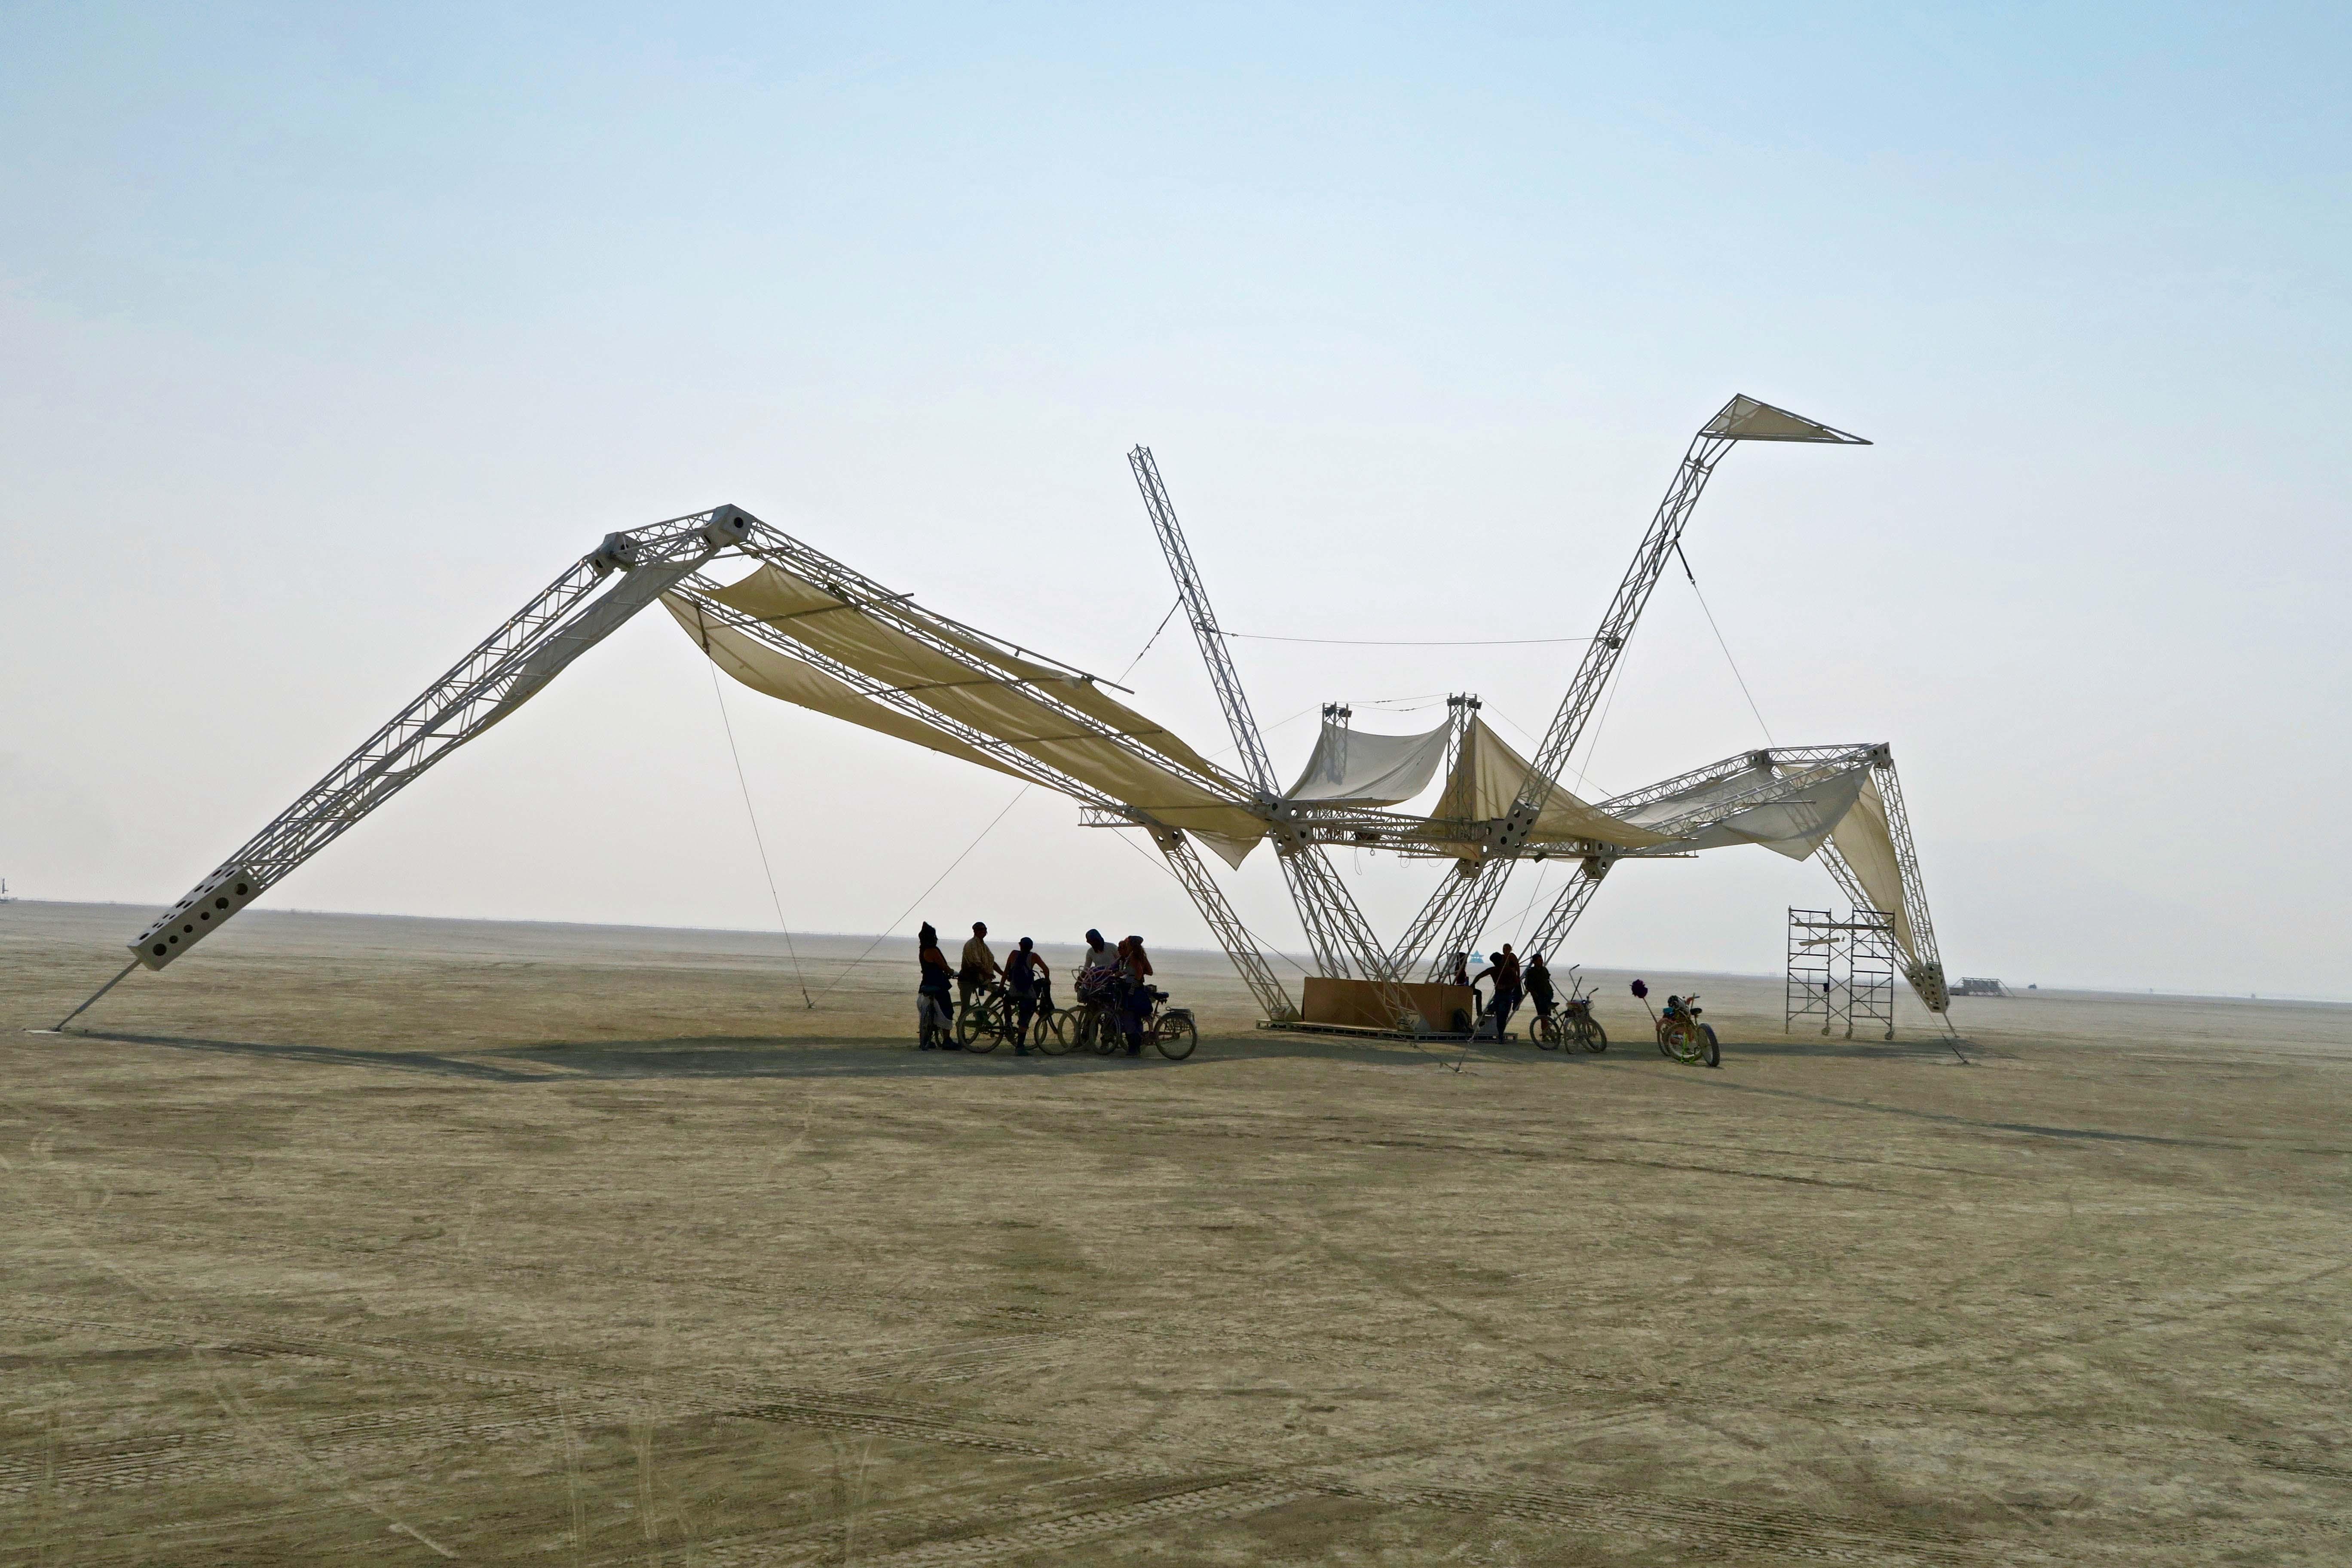 Giant crane named Coco at Burning Man 2017